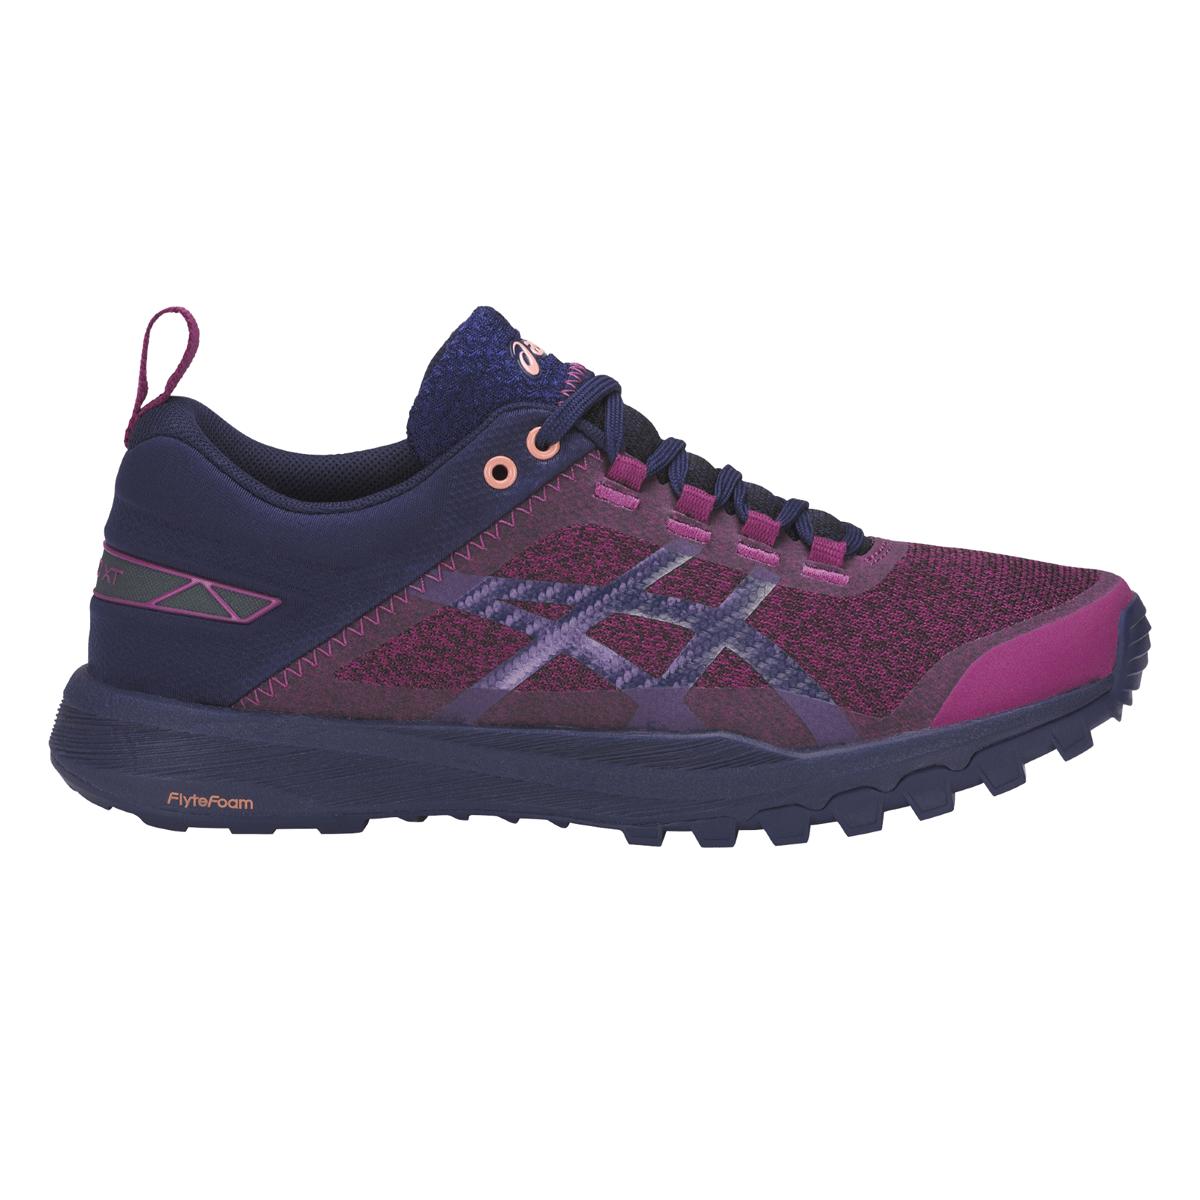 Asics Gecko XT - Damen Laufschuhe - Trailrunning - - - Trailschuhe - T876N-3249 4bc8cc